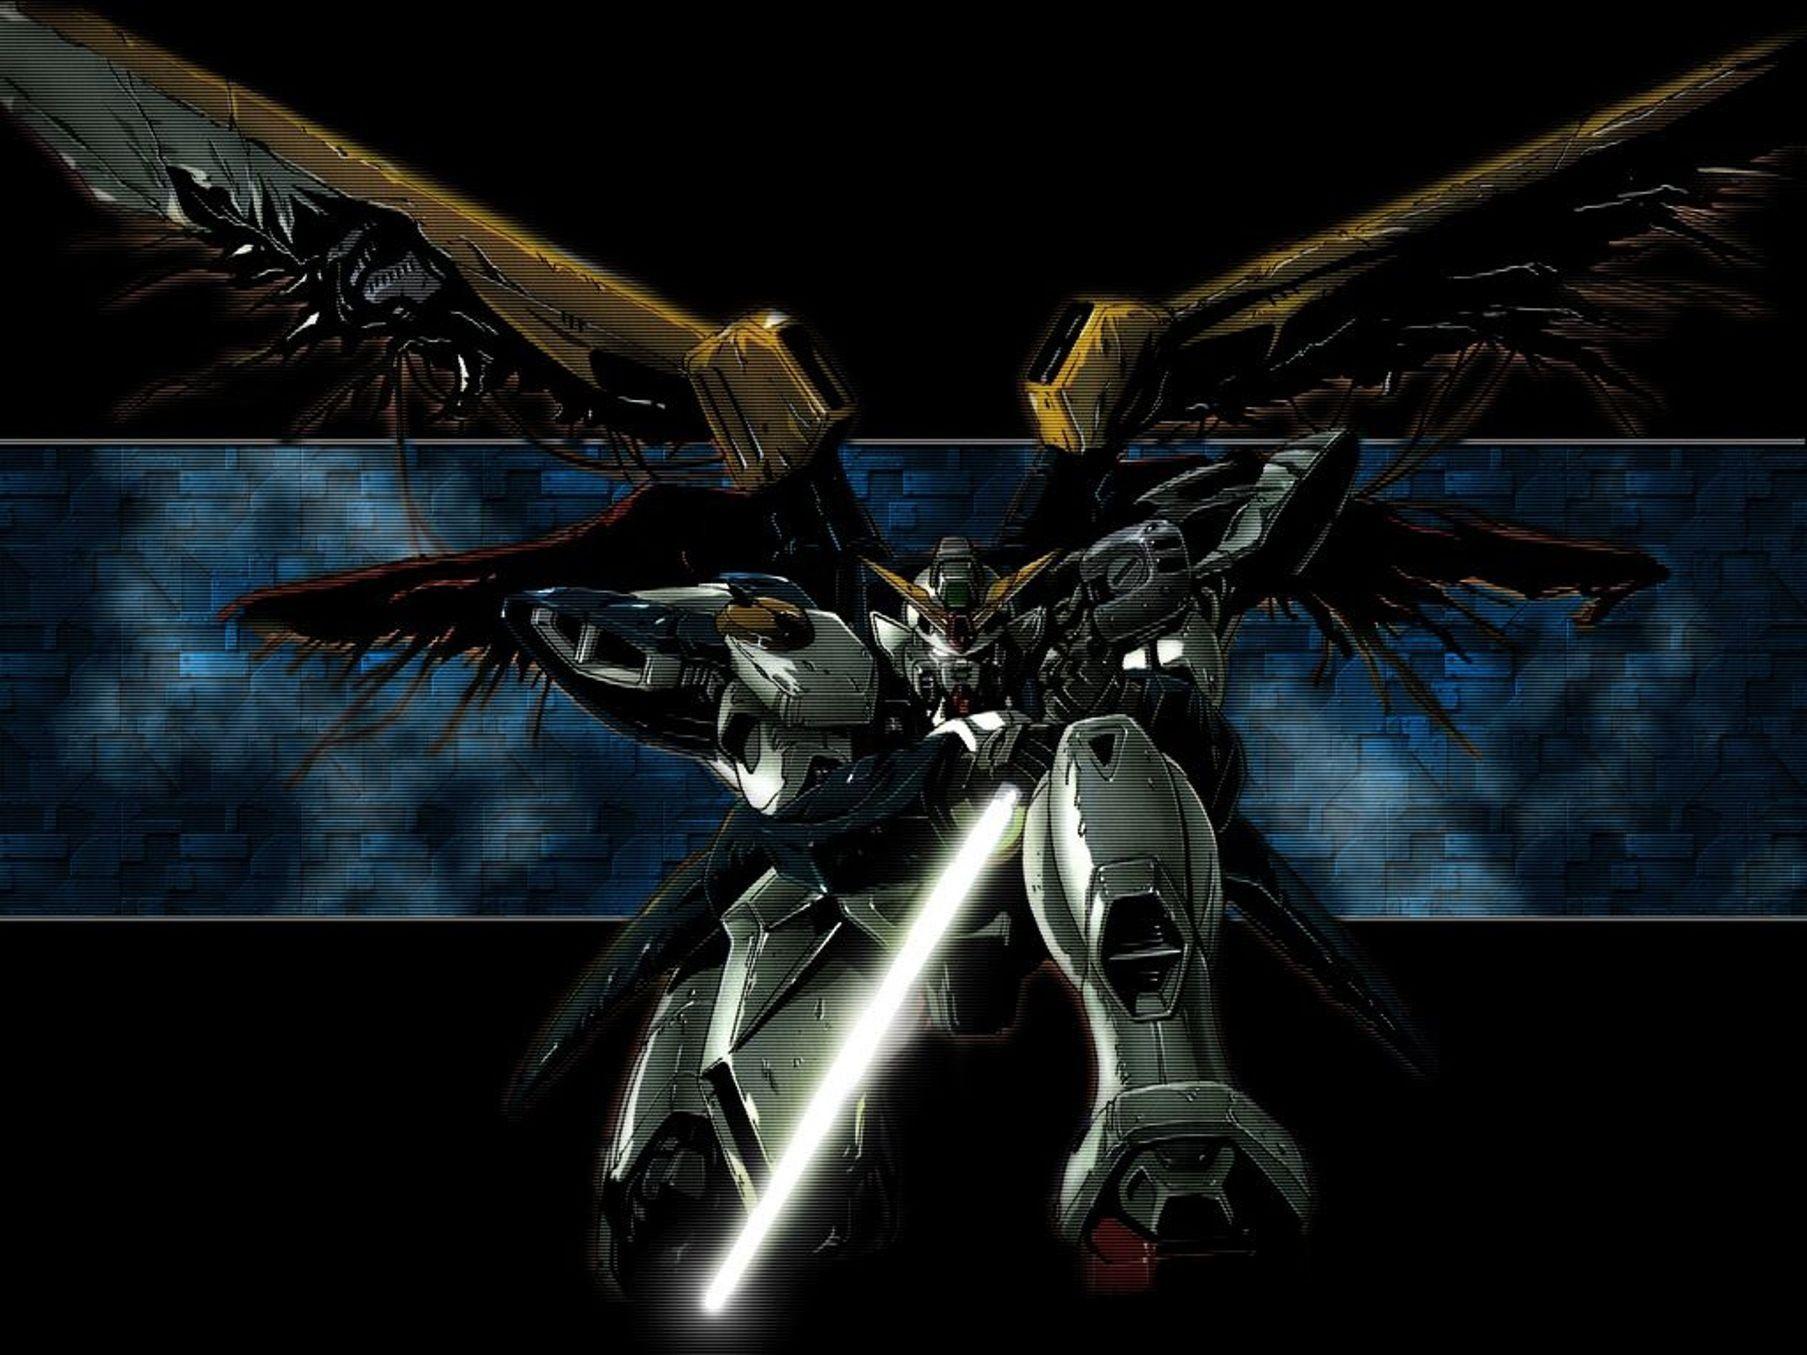 Pin by Skyi on Mobile suit Gundam Gundam wallpapers